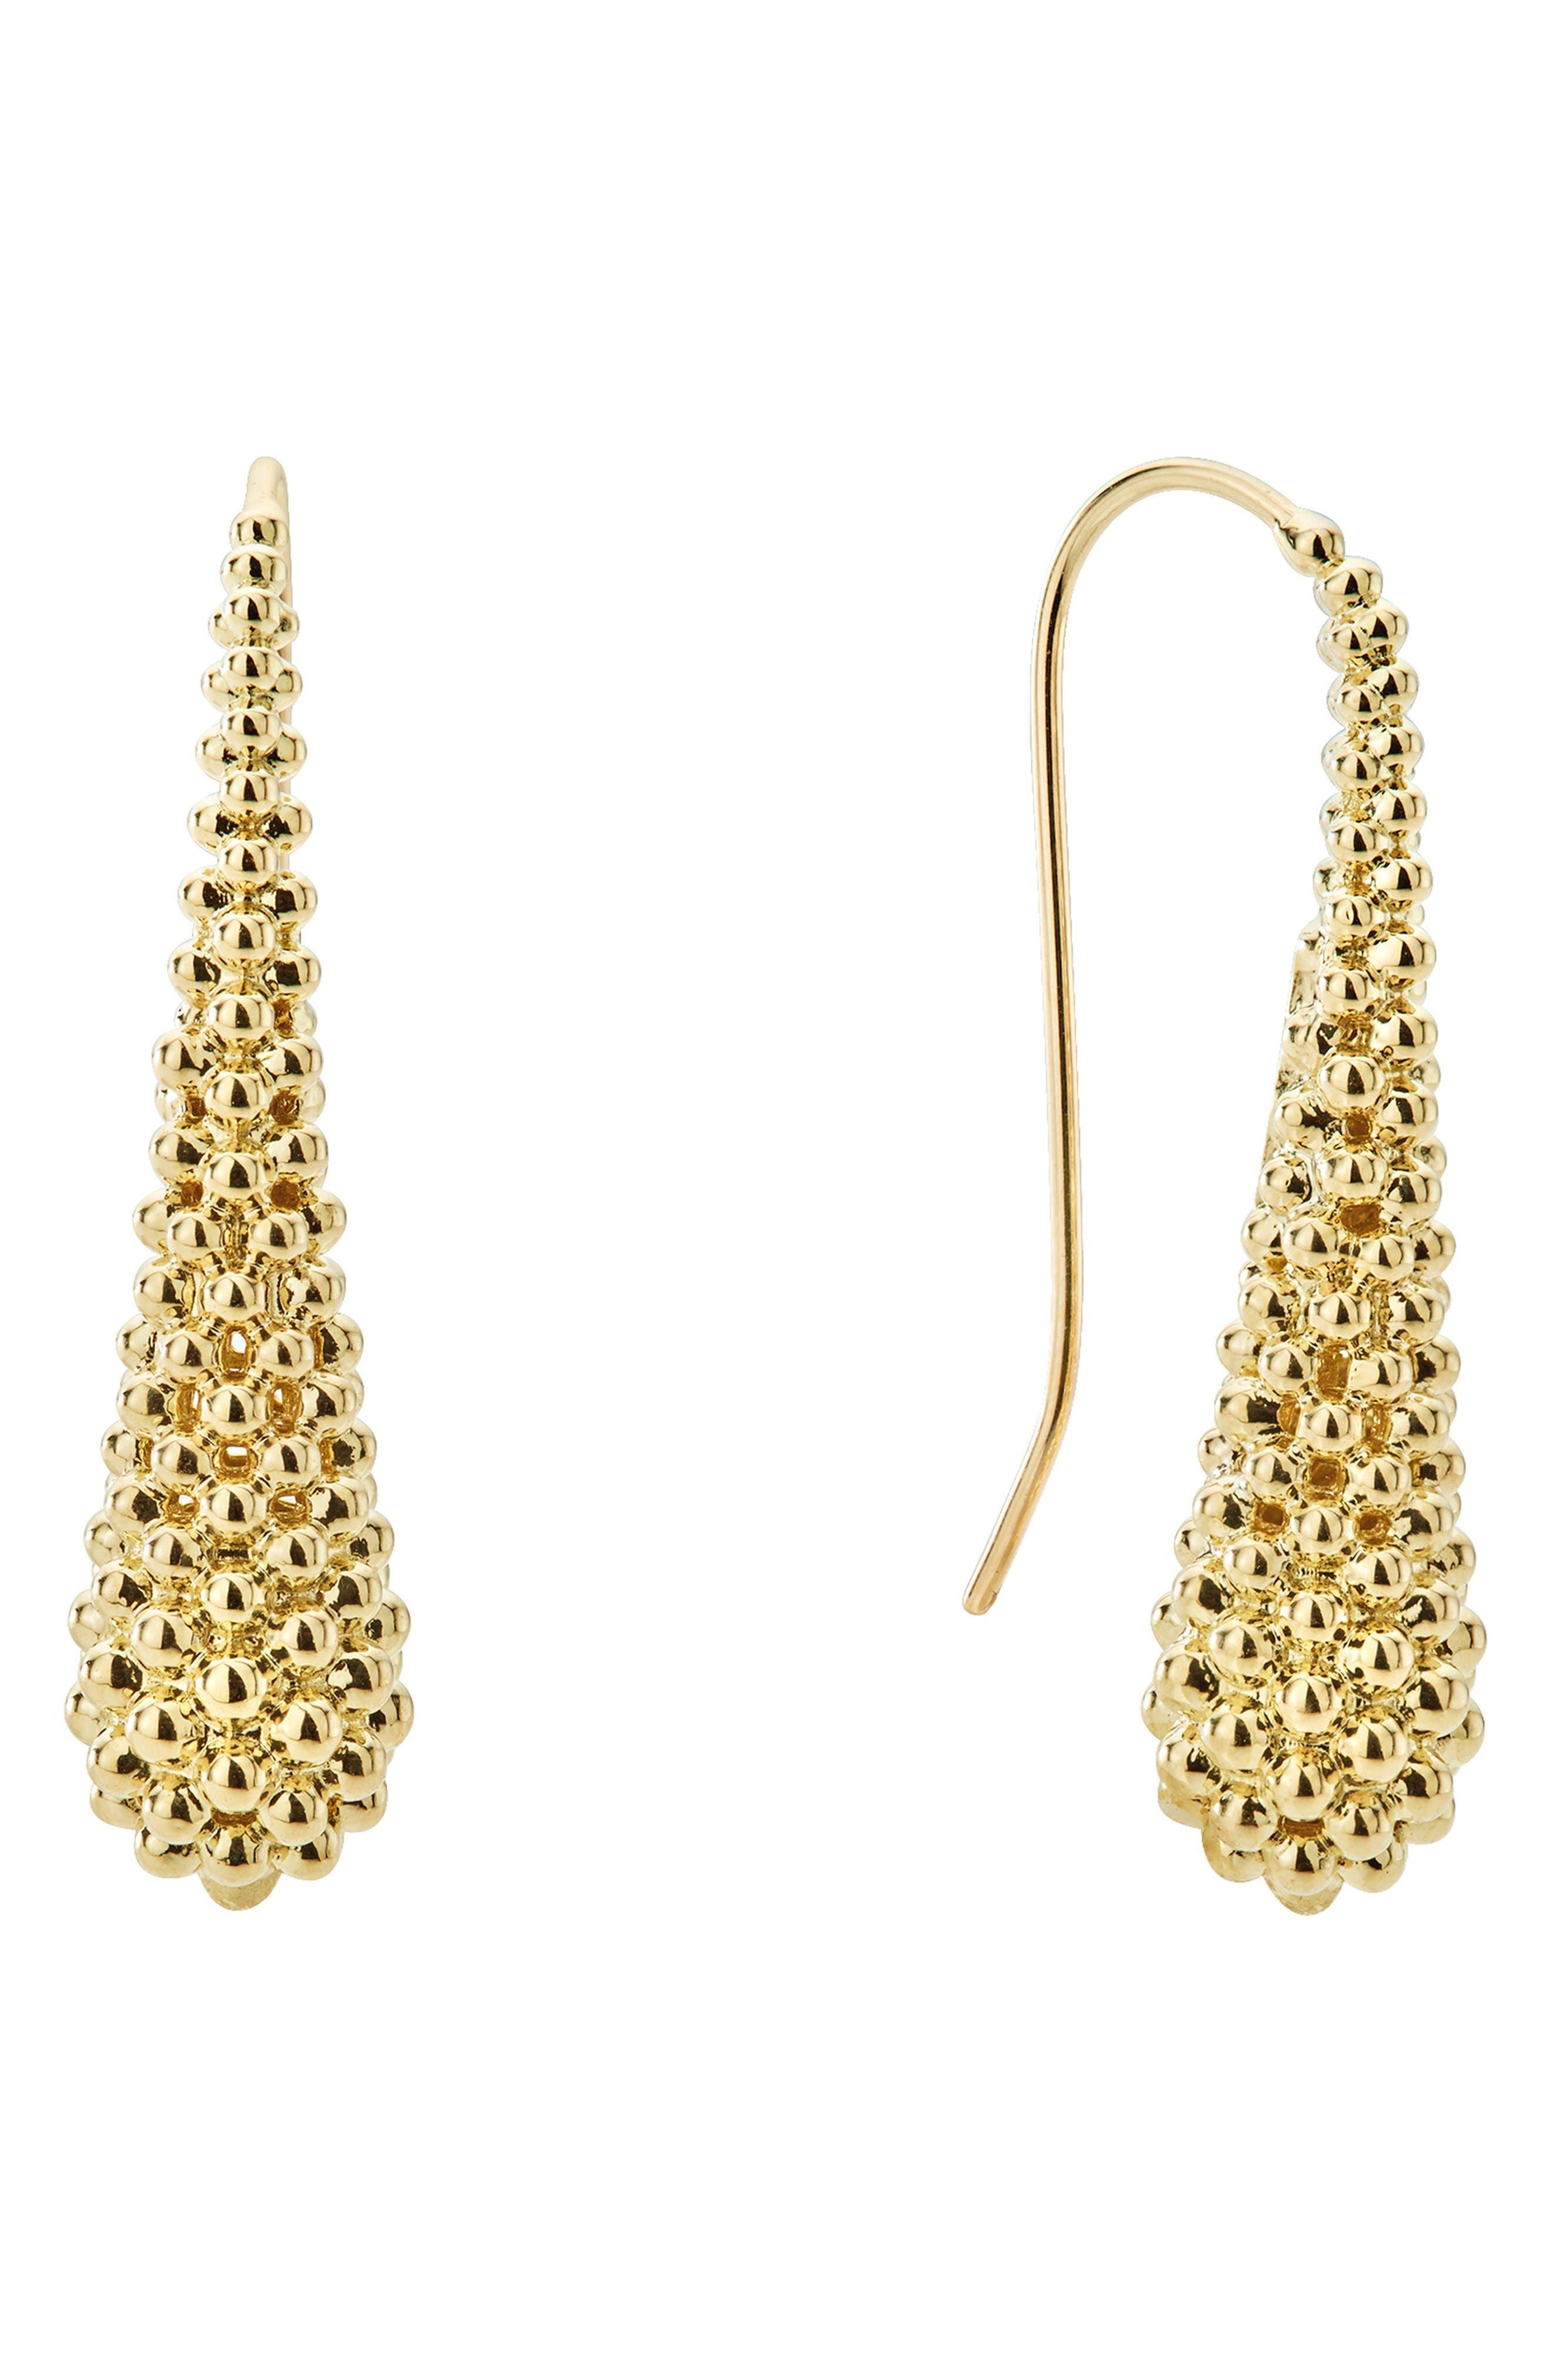 Caviar Gold Teardrop Earrings,                             Main thumbnail 1, color,                             GOLD